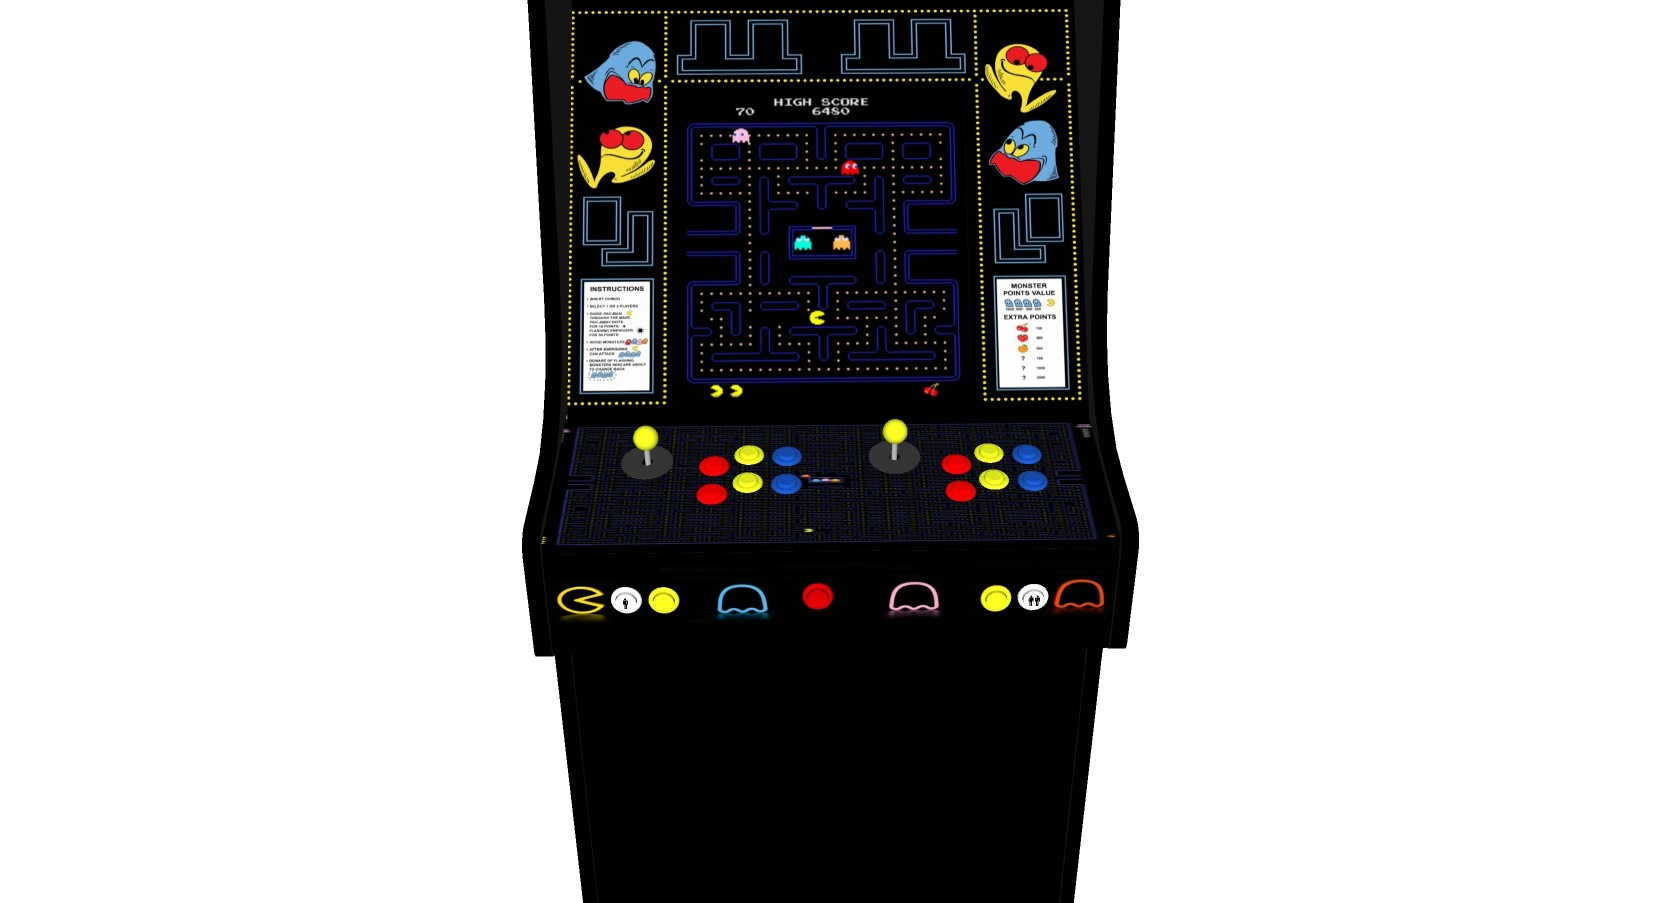 Classic Upright Arcade Machine - PacMan Theme - V2 - retropi 15000 games subwoofer buttons